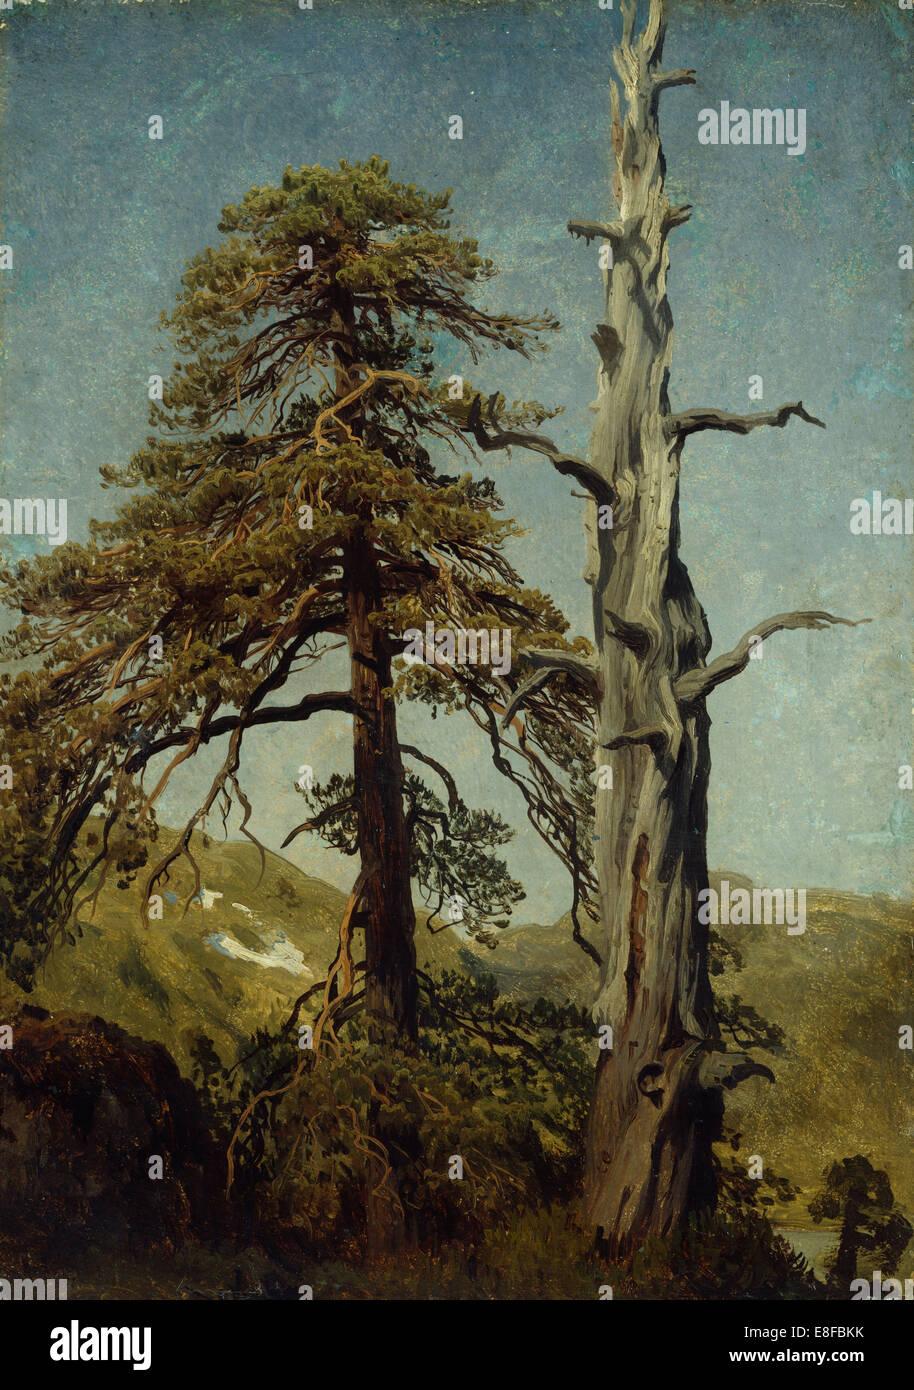 Study of Trees. Artist: Cappelen, August (1827-1852) - Stock Image